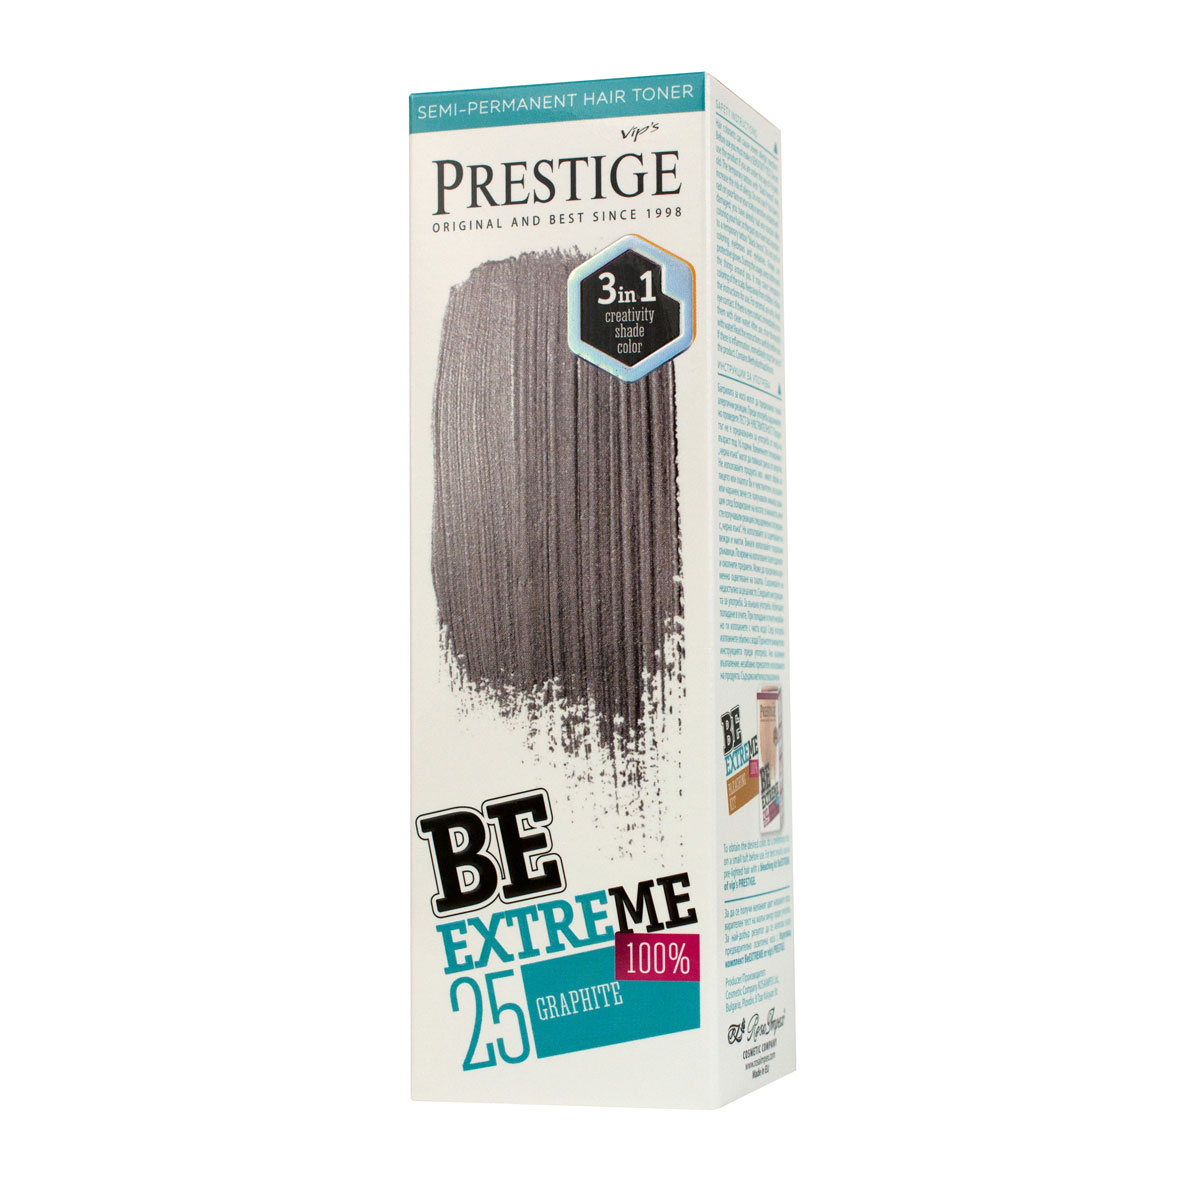 BE EXTREME HAIR TONER BR 25 GRAPHITE